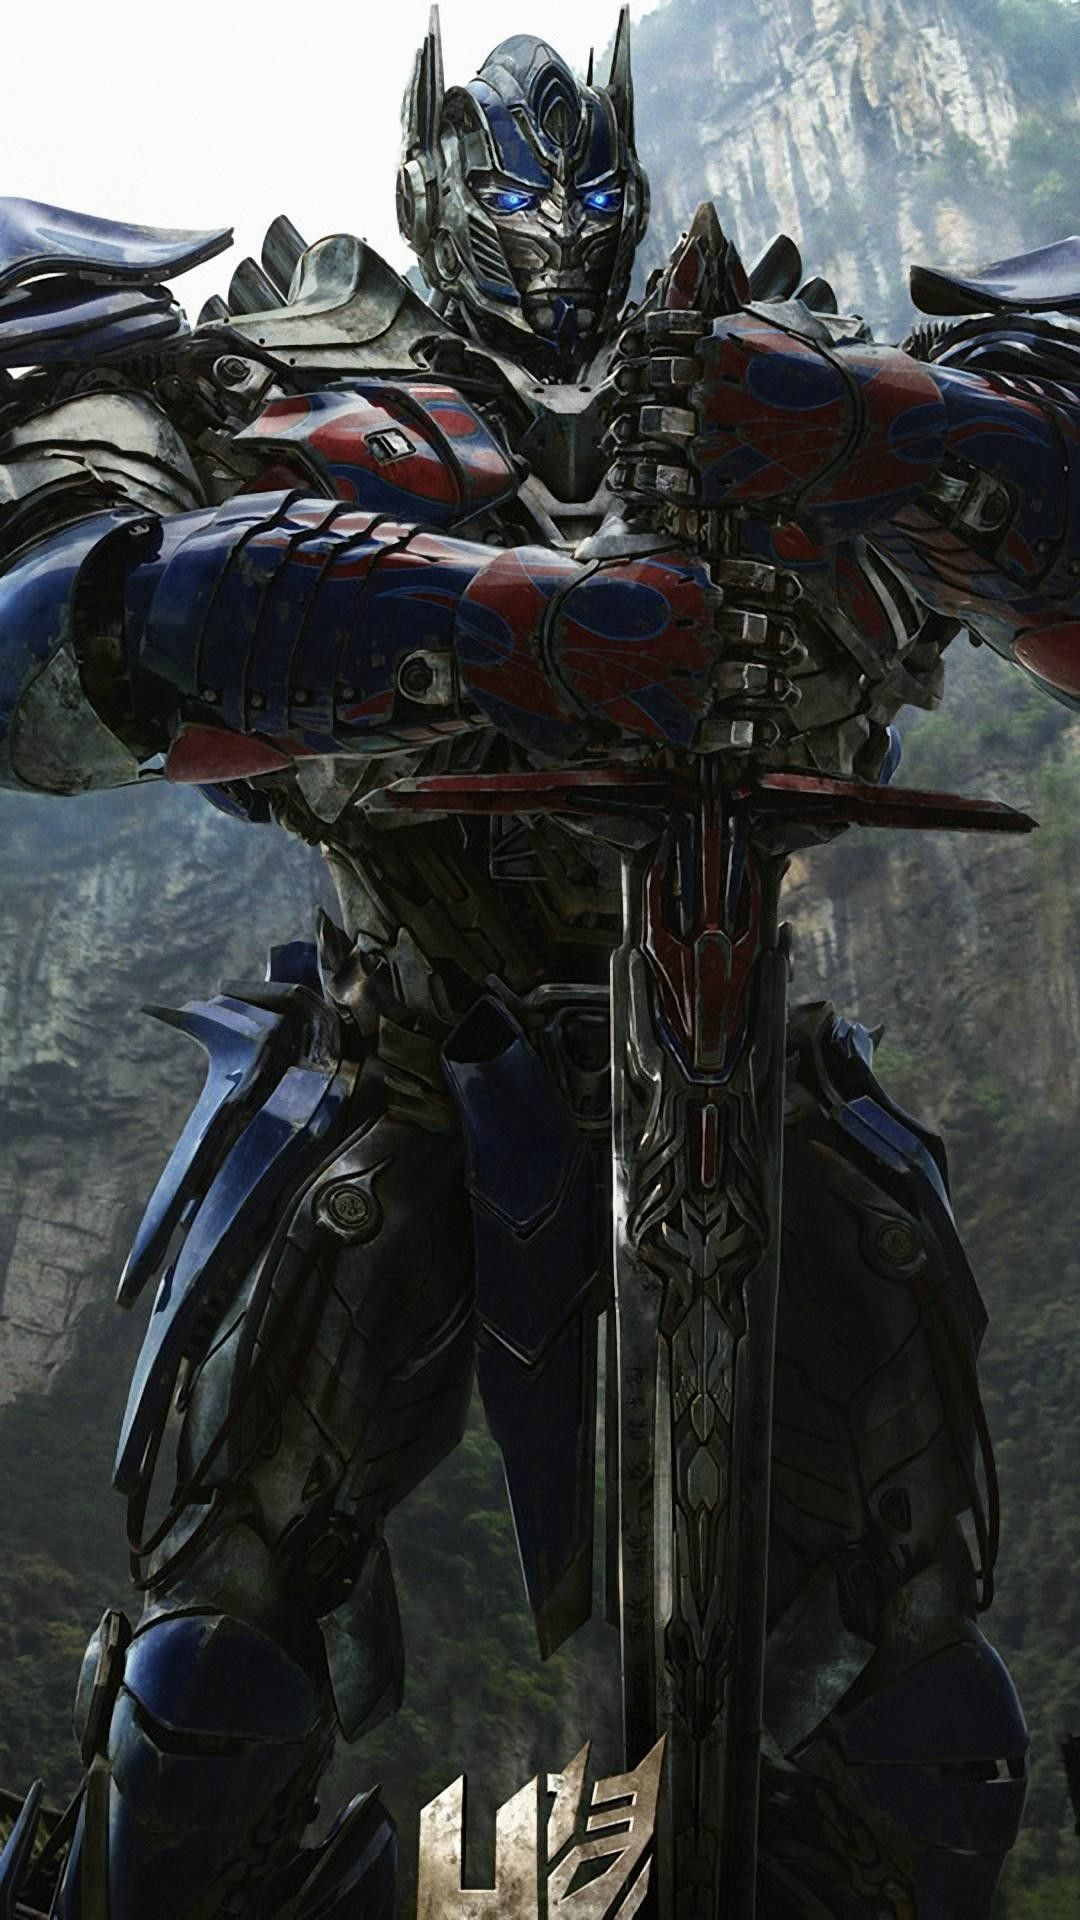 1080x1920 Wallpaper Wiki 1080 X 1920 Image Vertical Download Optimus Prime Wallpaper Optimus Prime Wallpaper Transformers Transformers Optimus